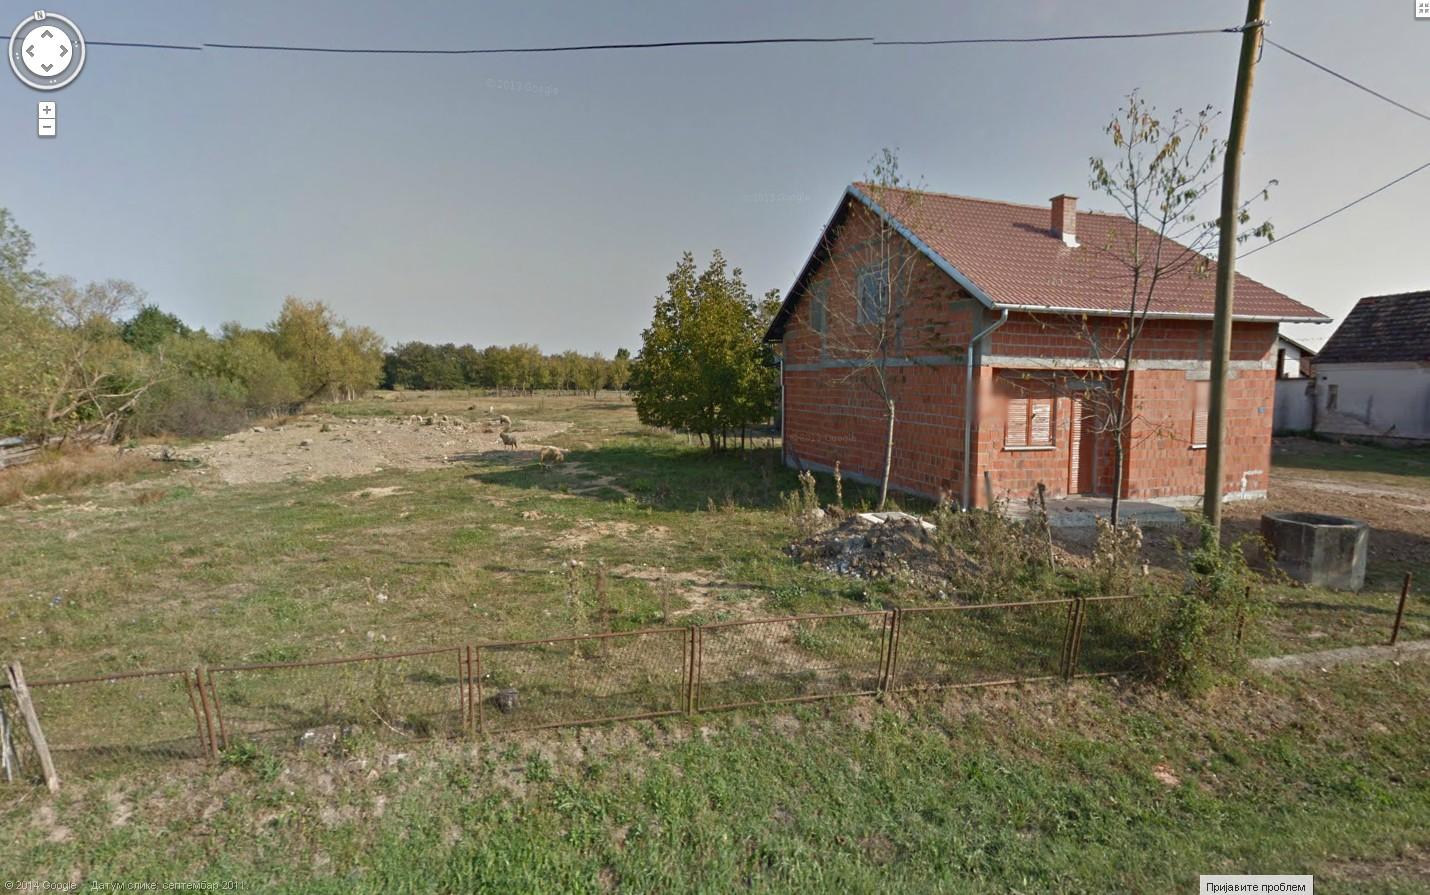 Vente terrain agricole sunja sisa ko moslava ka upanija for Agrandissement maison terrain agricole